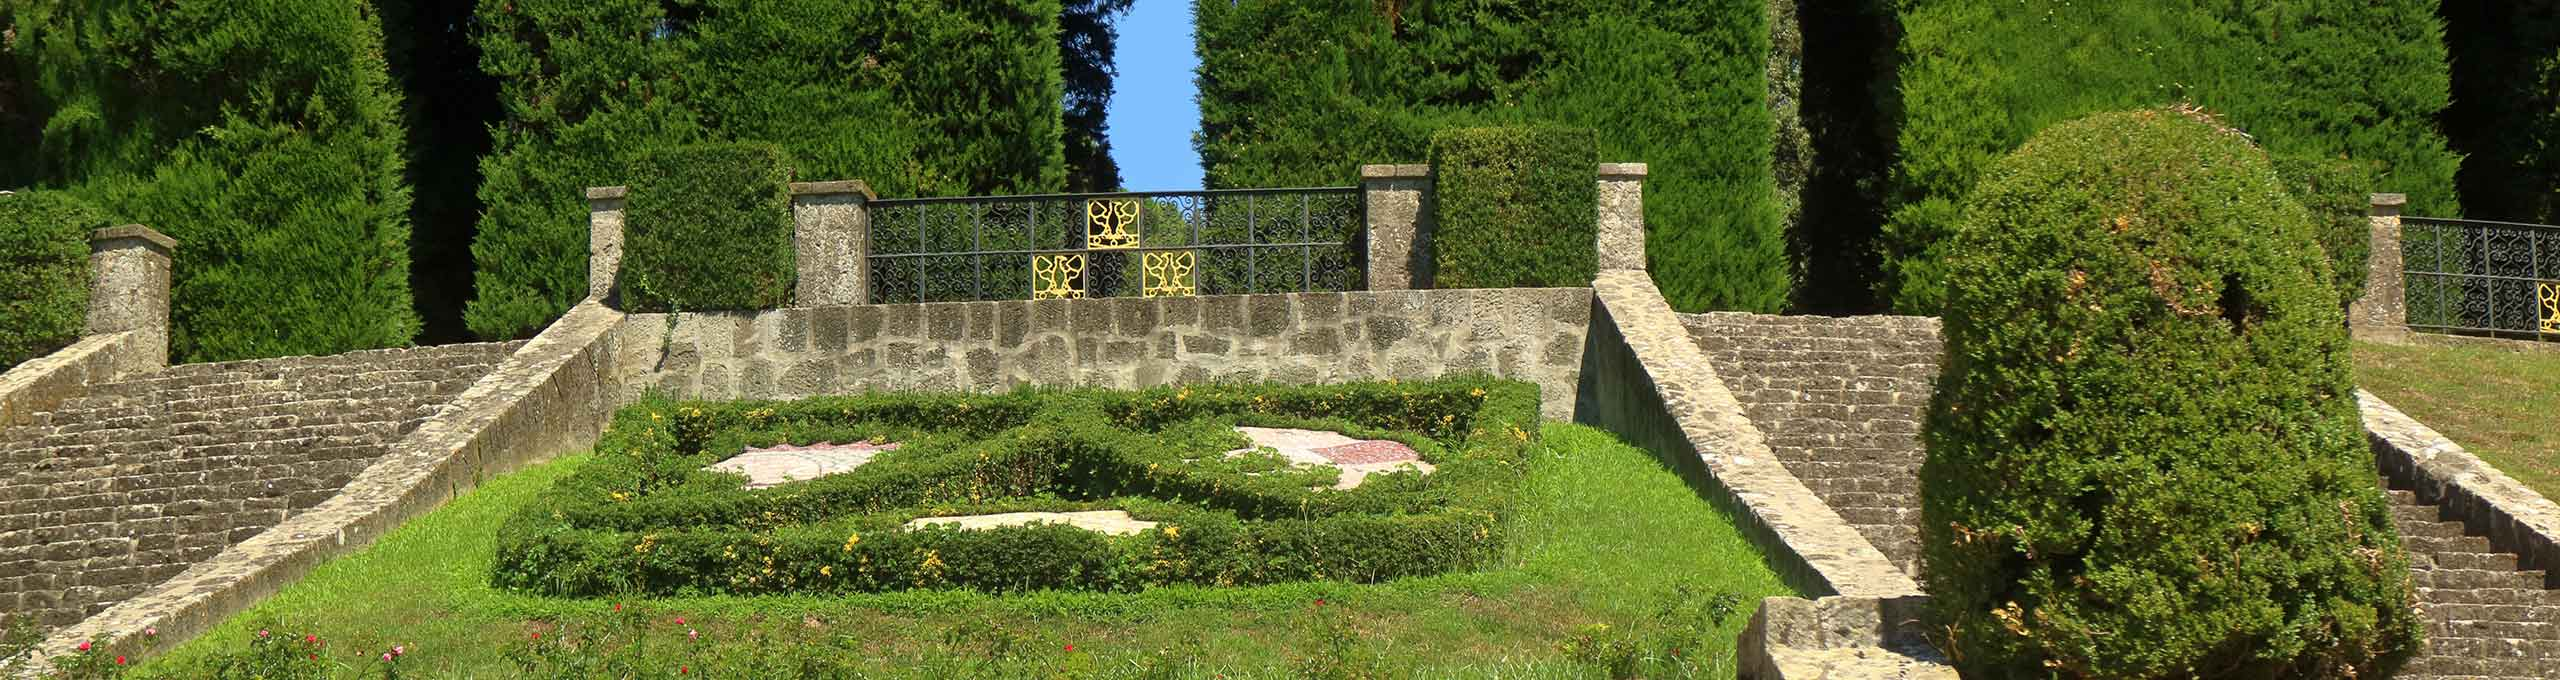 Castel Gandolfo, residenza estiva del Papa